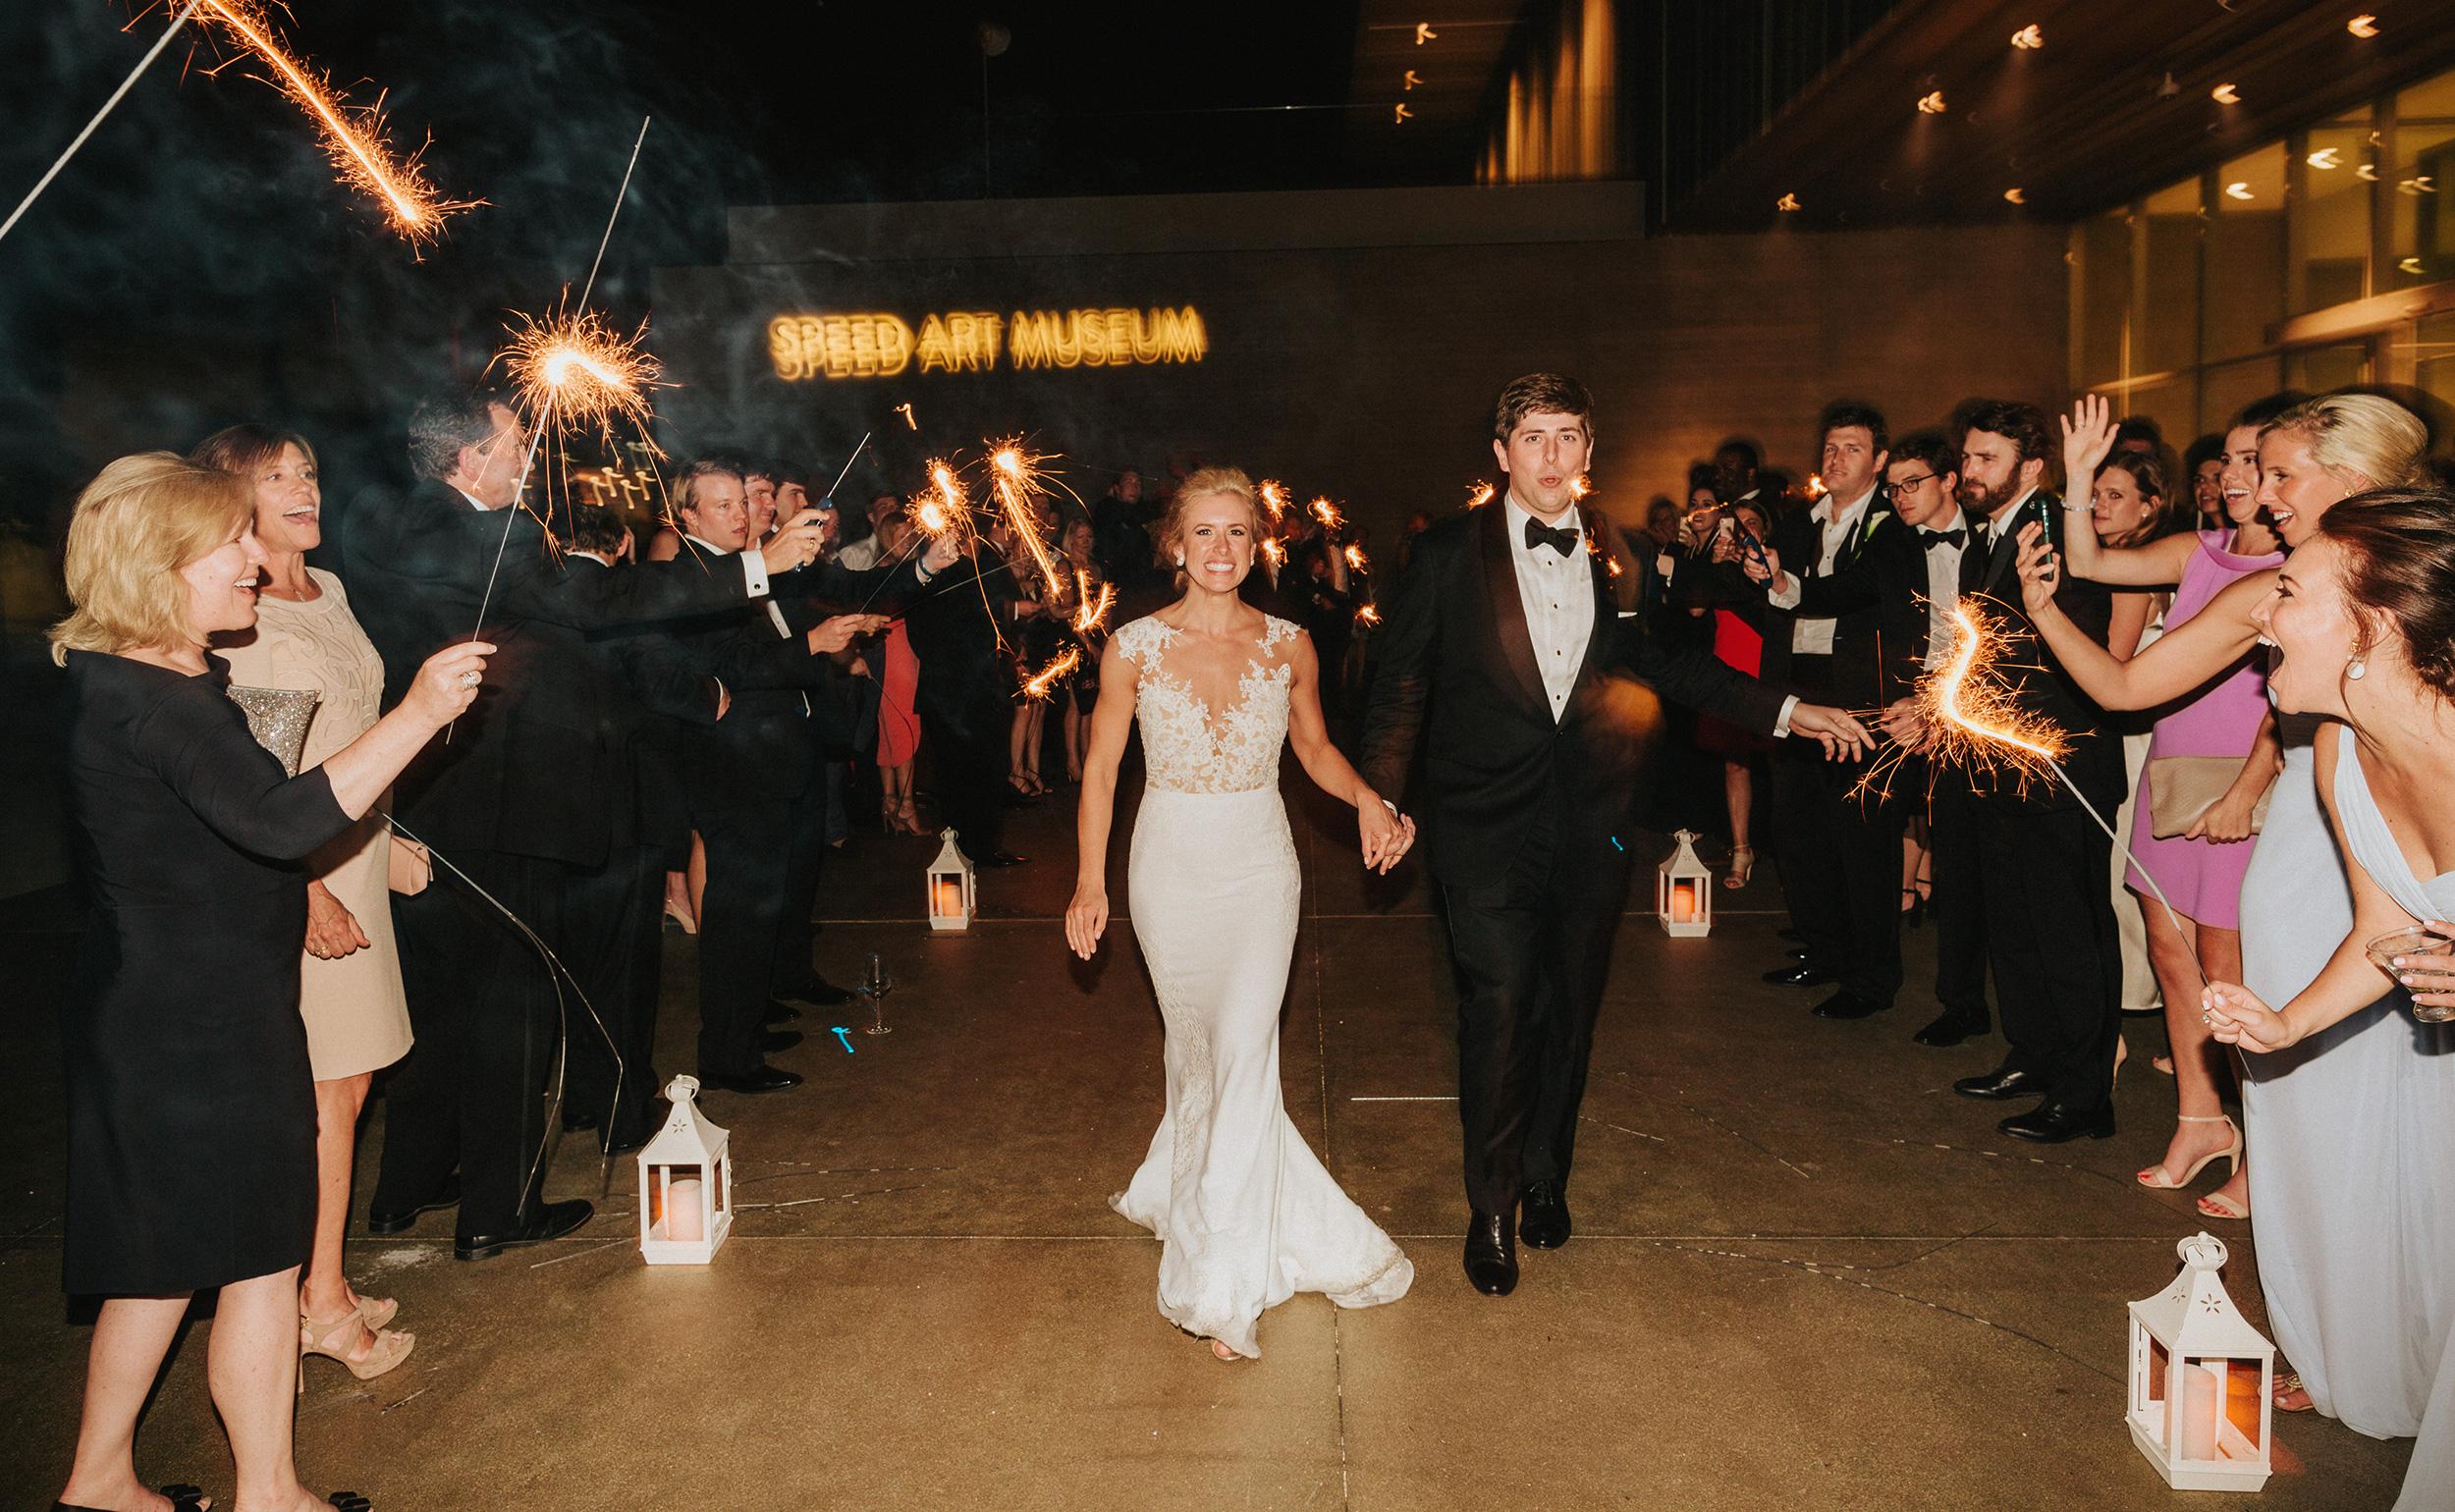 speed-art-museum-wedding-photographer-39.JPG